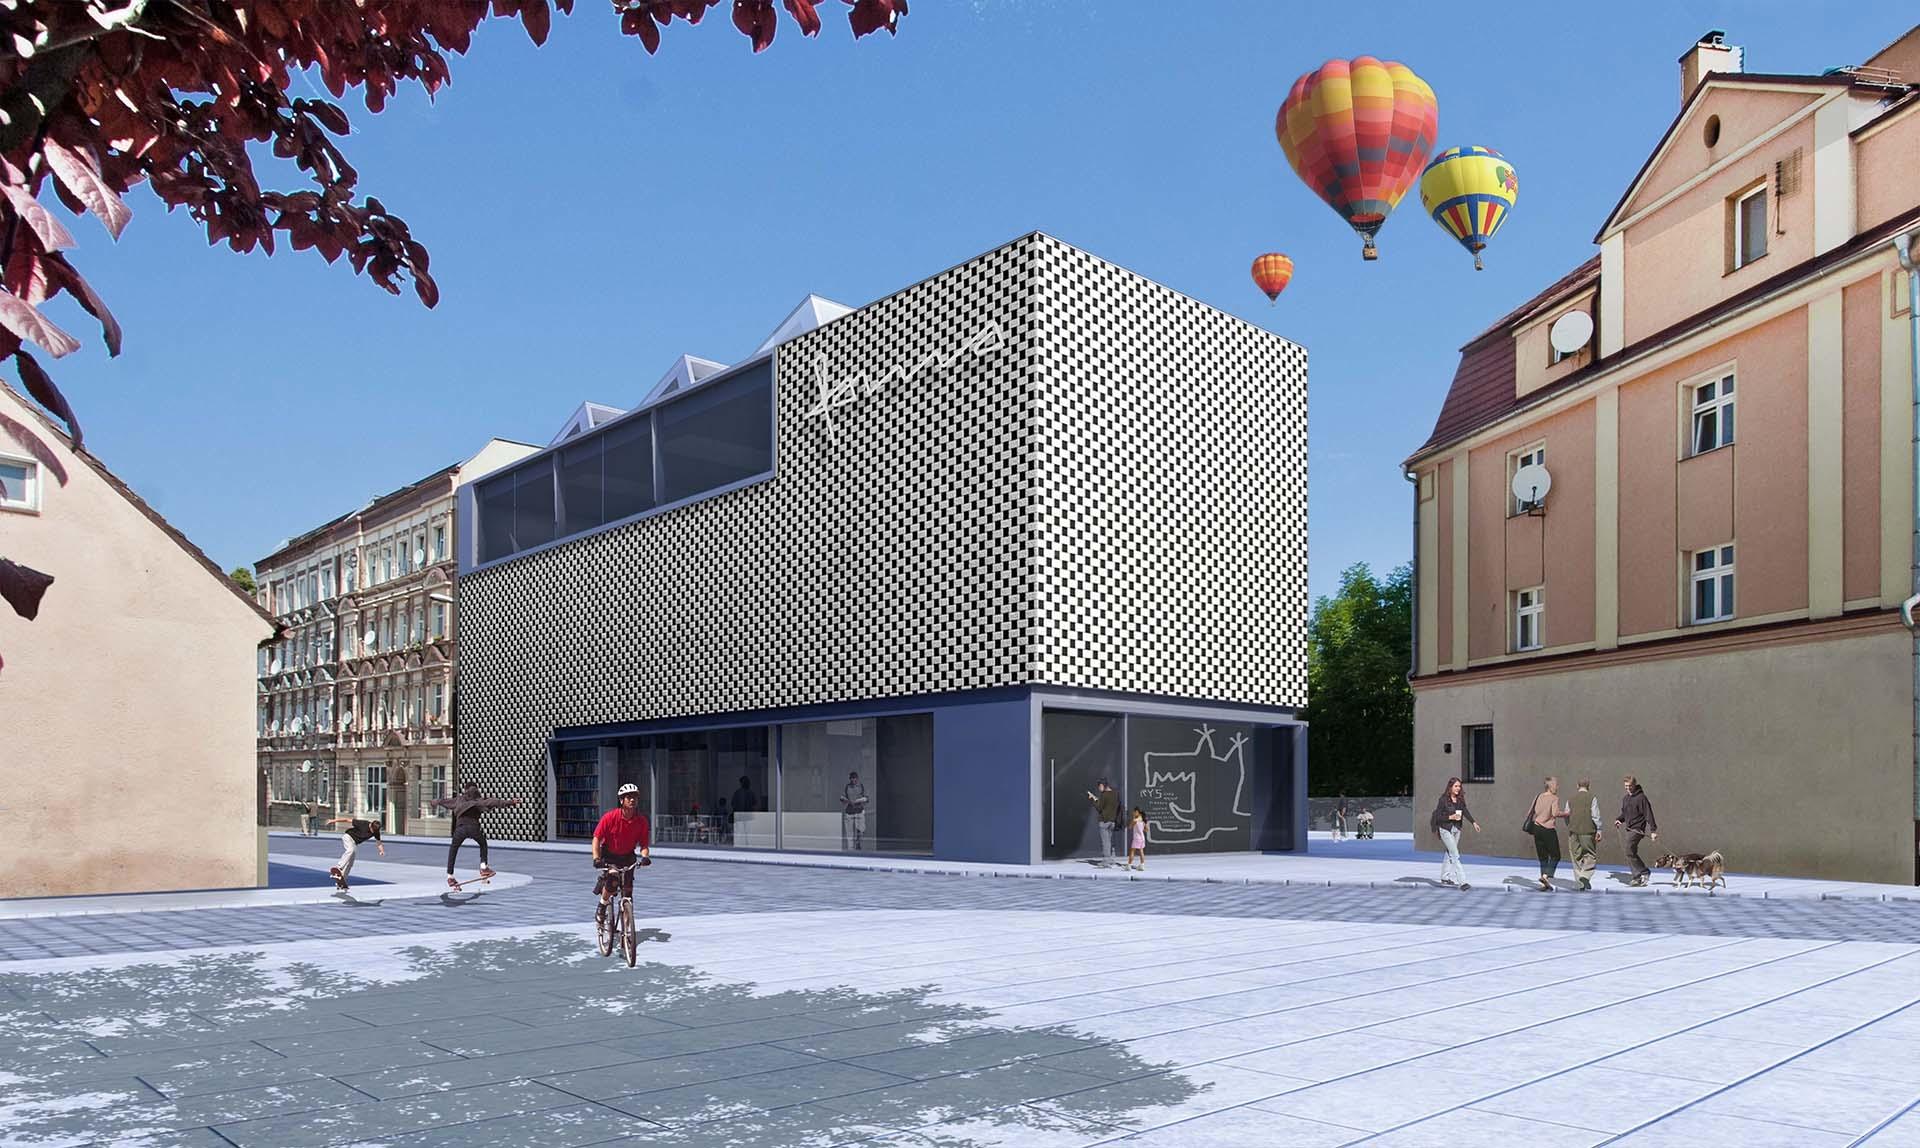 Sofft Mikołaj Smoleński FAMA culture center